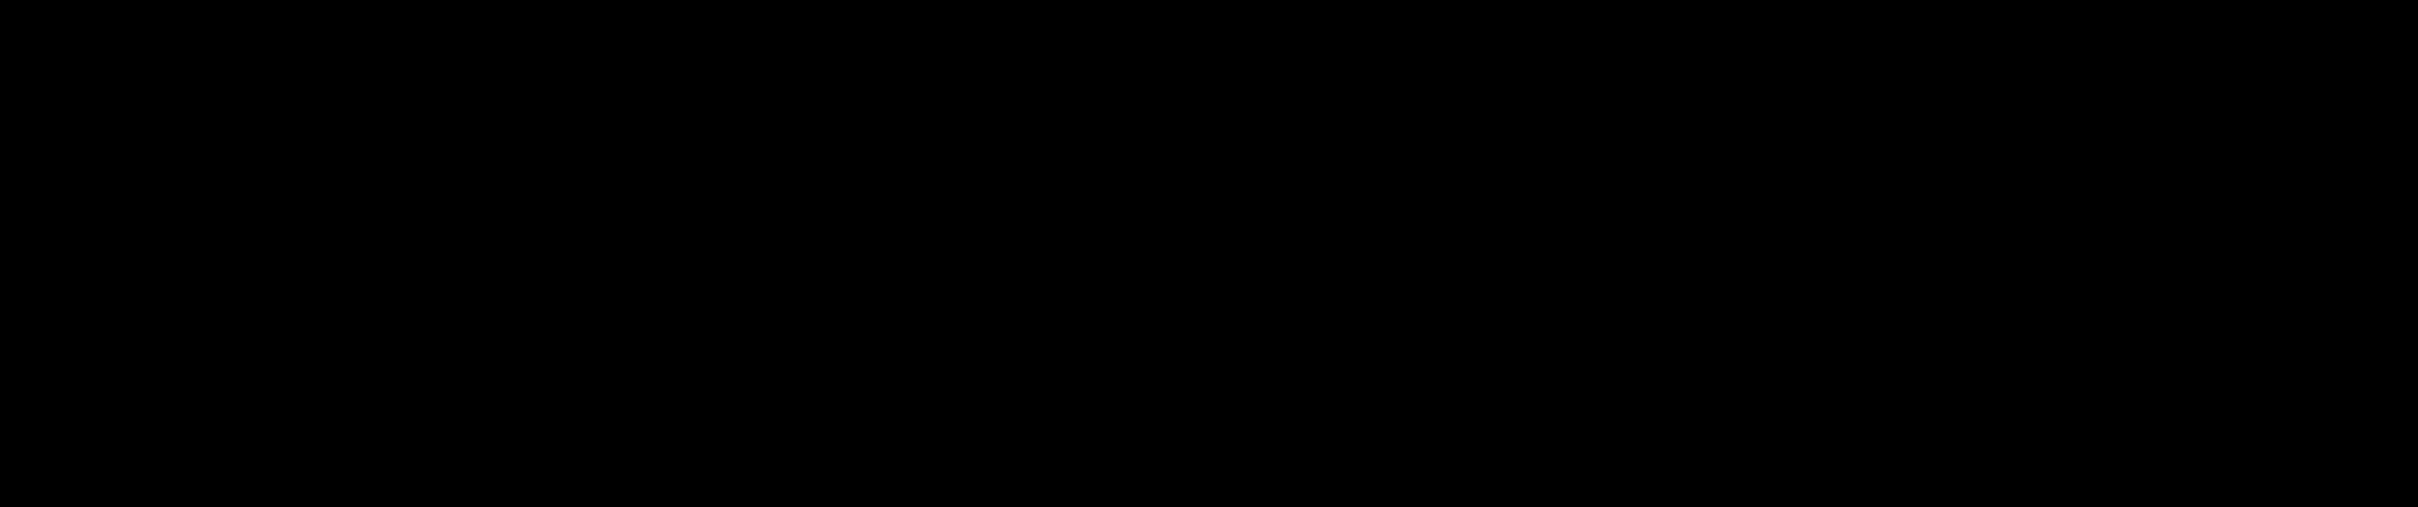 Falcon Concrete logo